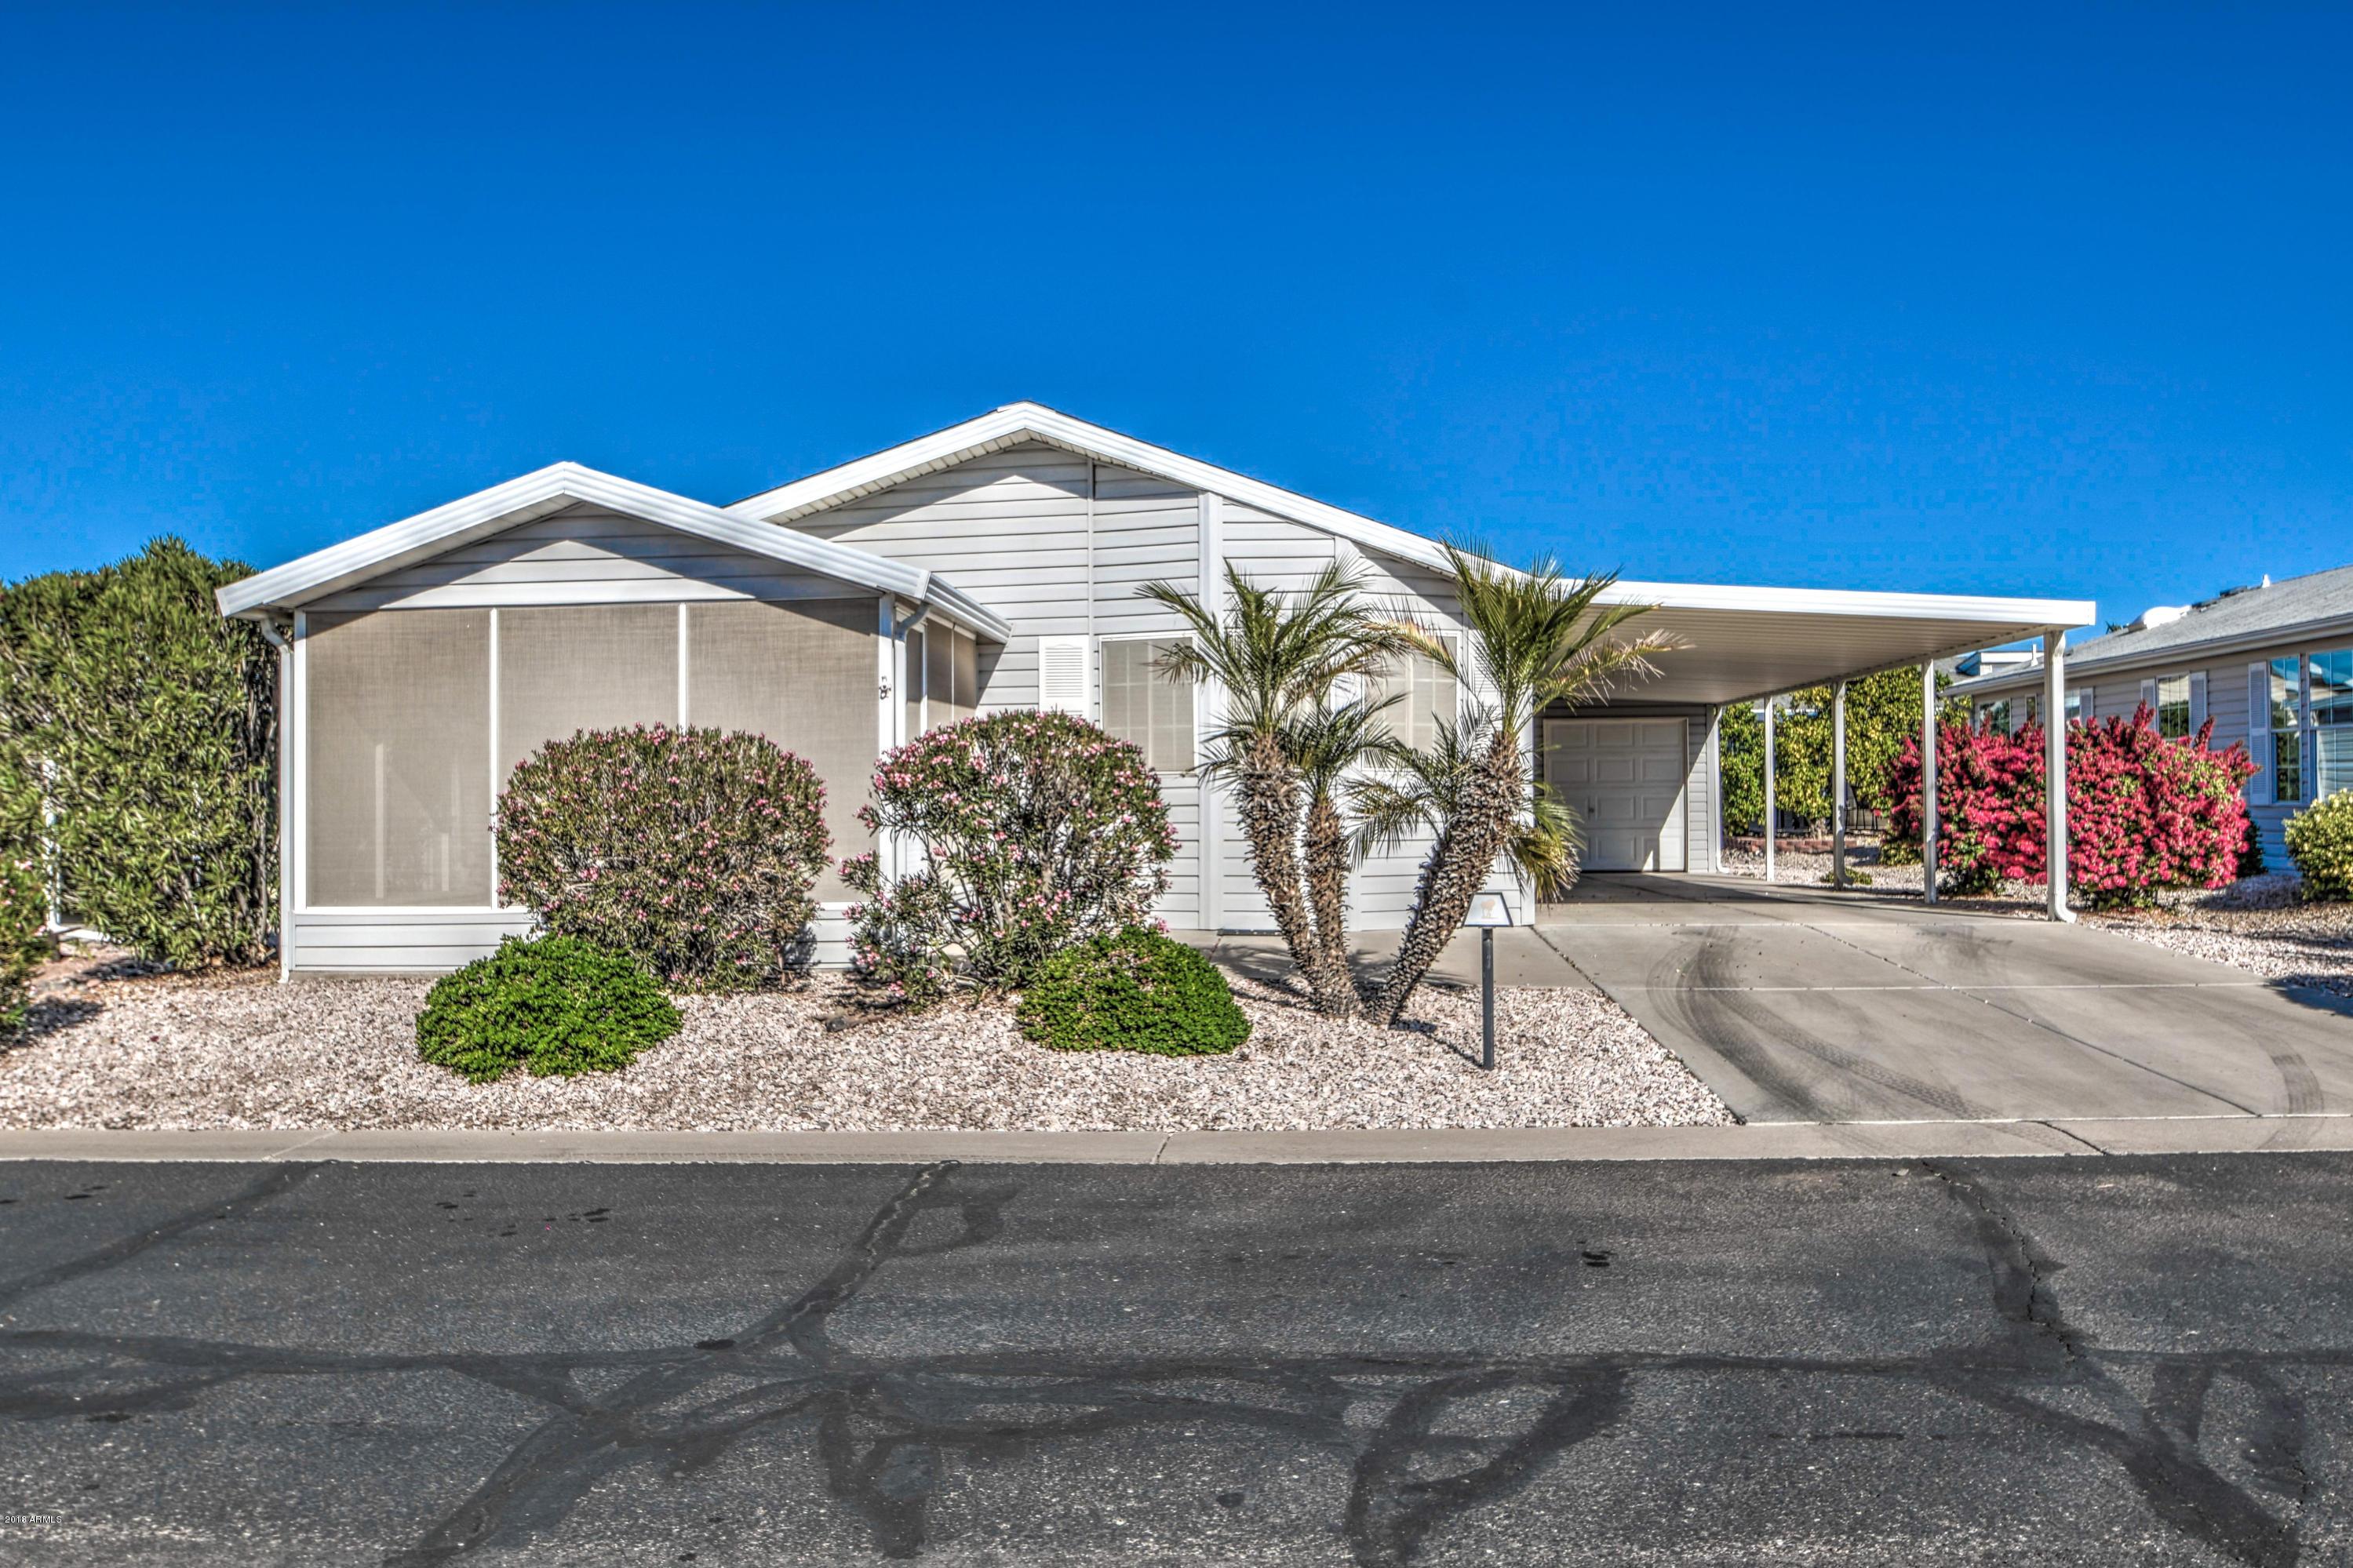 Photo of 2550 S Ellsworth Road #375, Mesa, AZ 85209